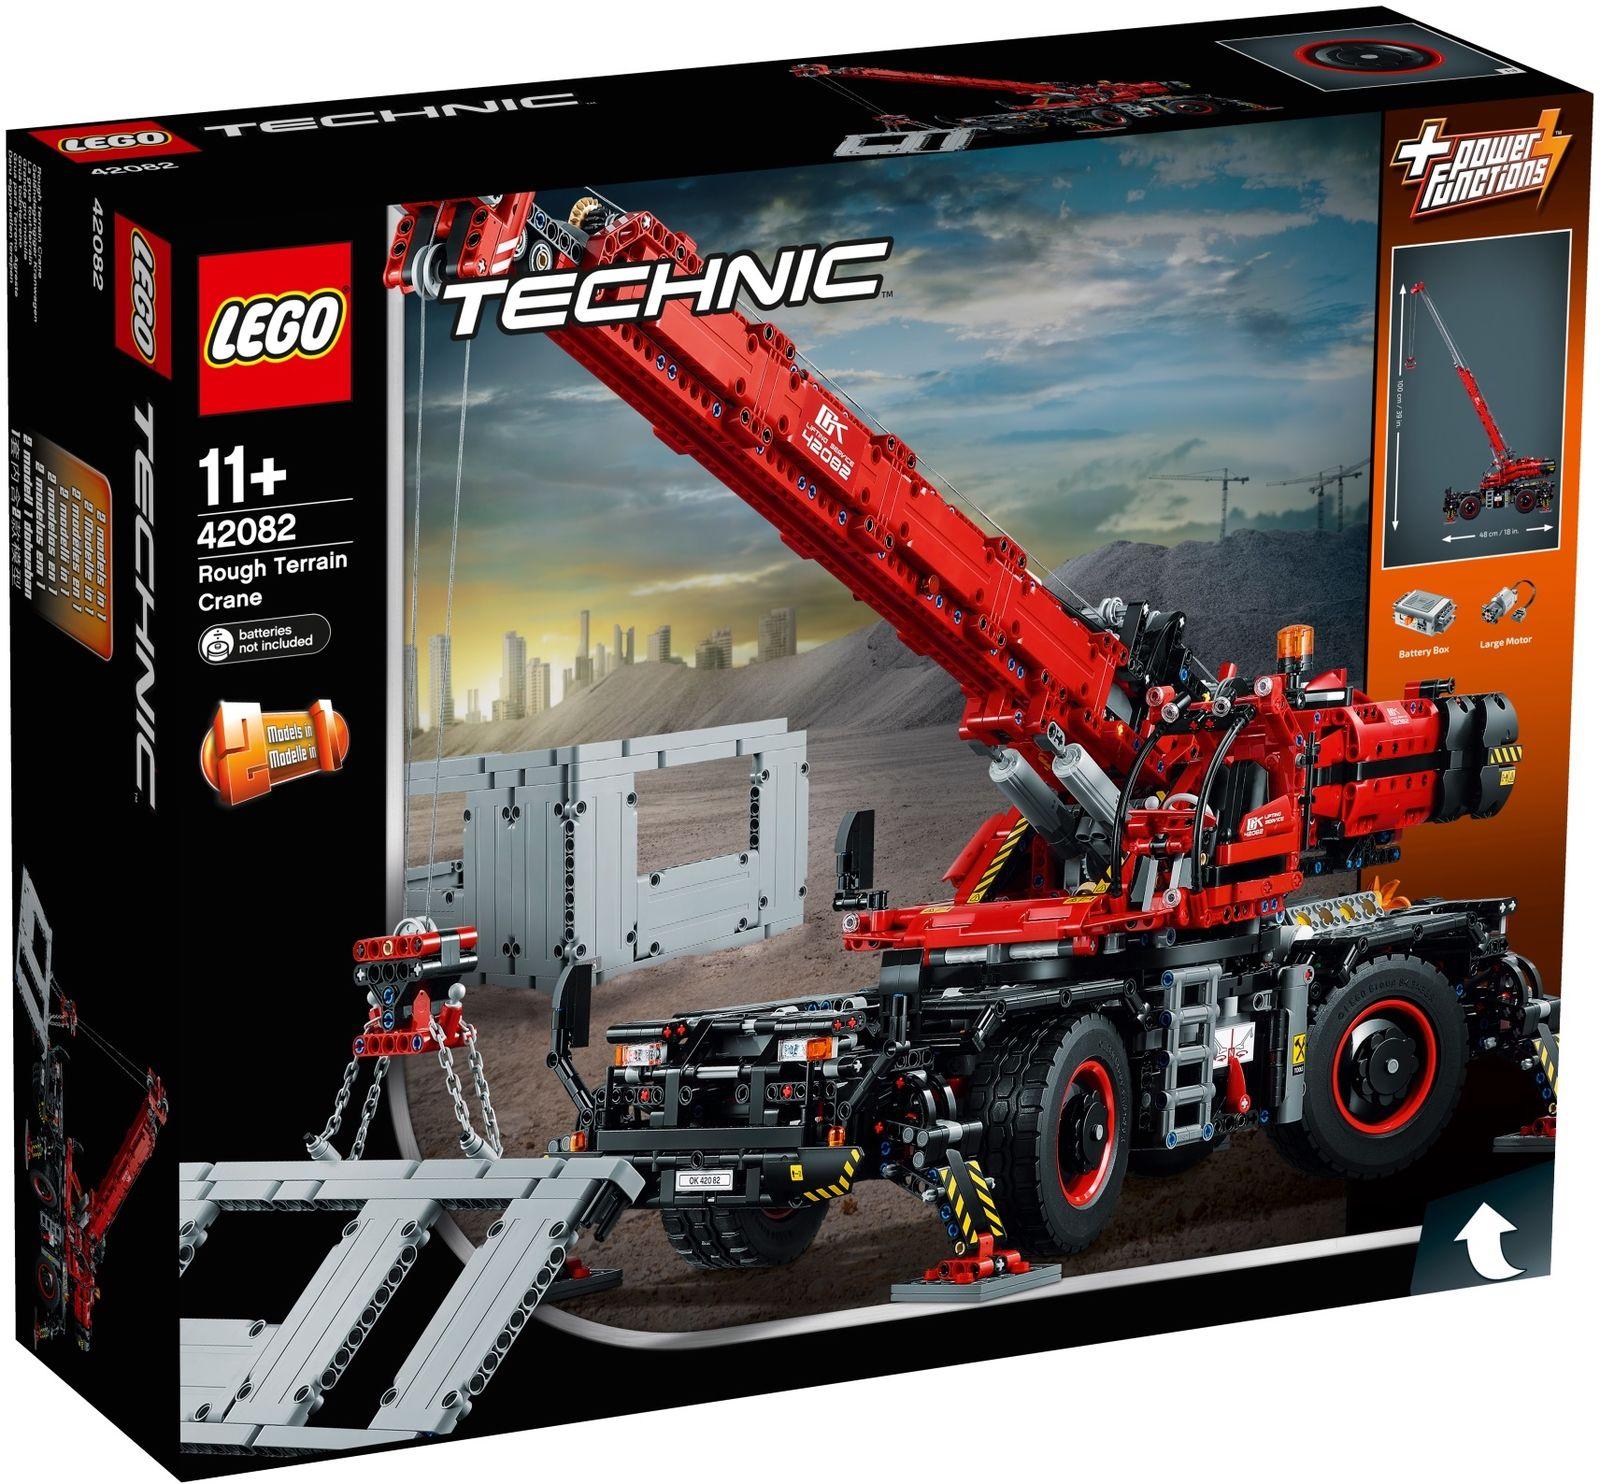 Lego Technic 42082 - Geländegängiger Kranwagen